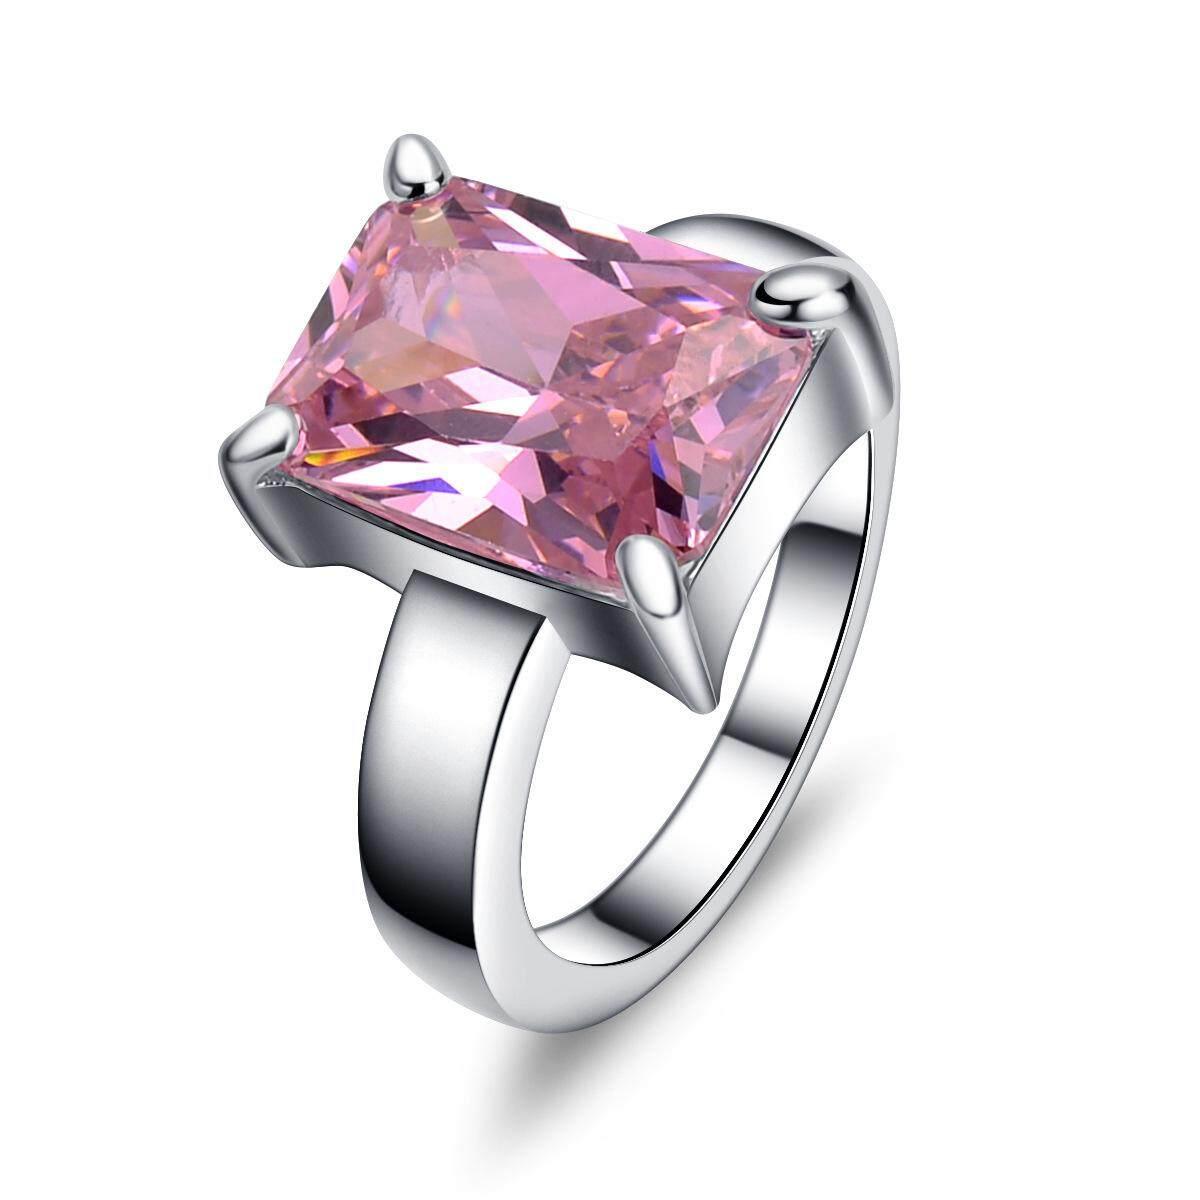 Terbaik Jual Perhiasan Wanita Berlian Emas Putih Cincin Berlian Hari Kasih Sayang Aksesoris-Intl